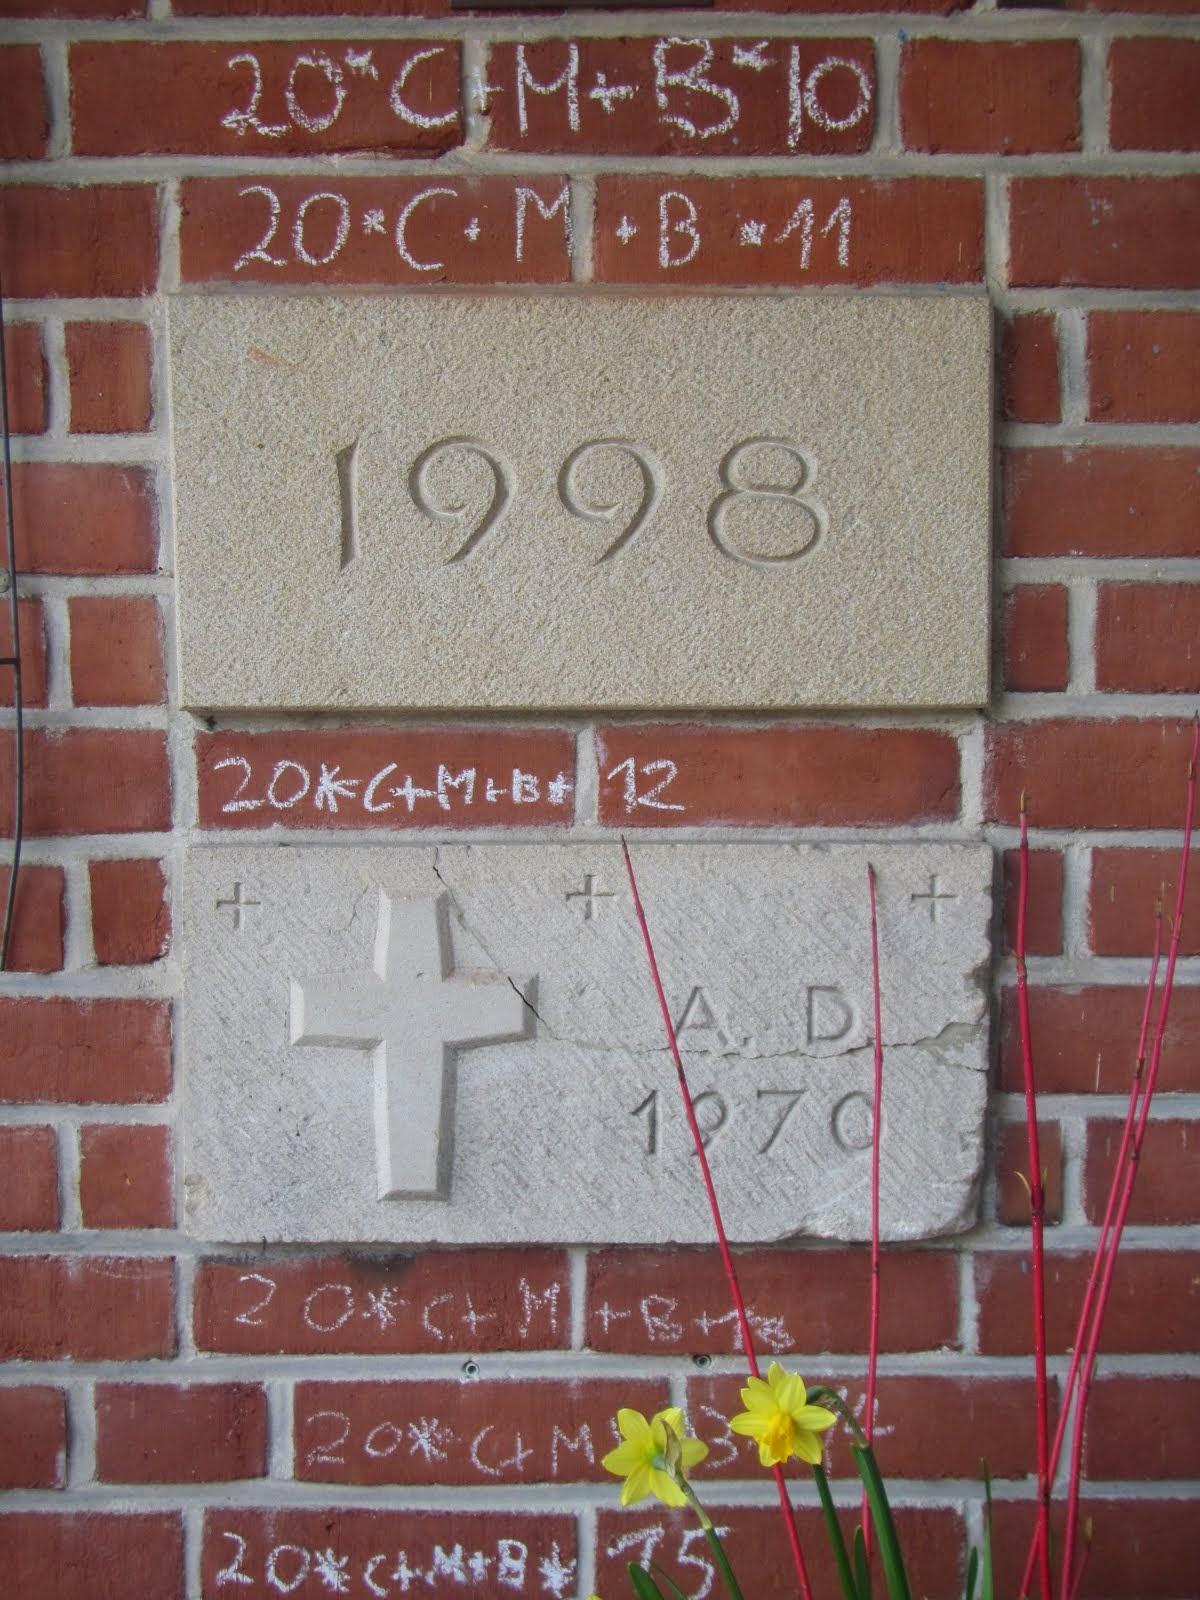 1998 - 1970